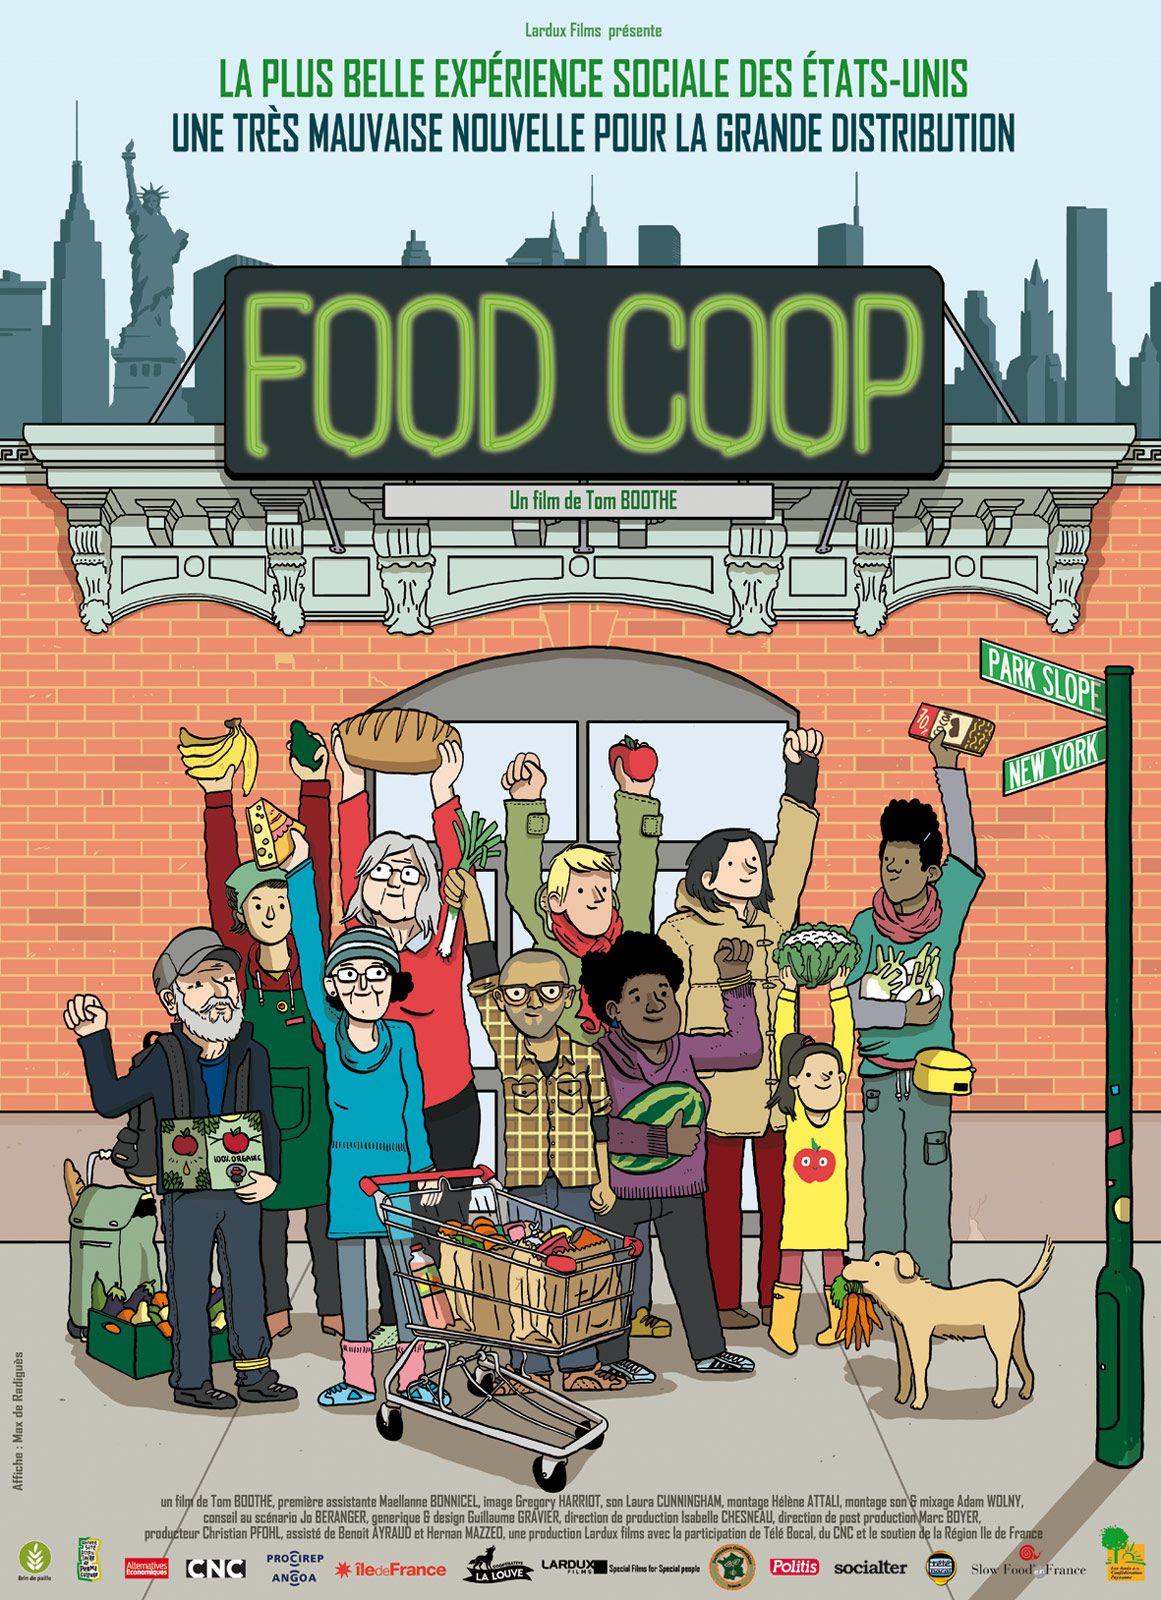 Food Coop - Documentaire (2016)